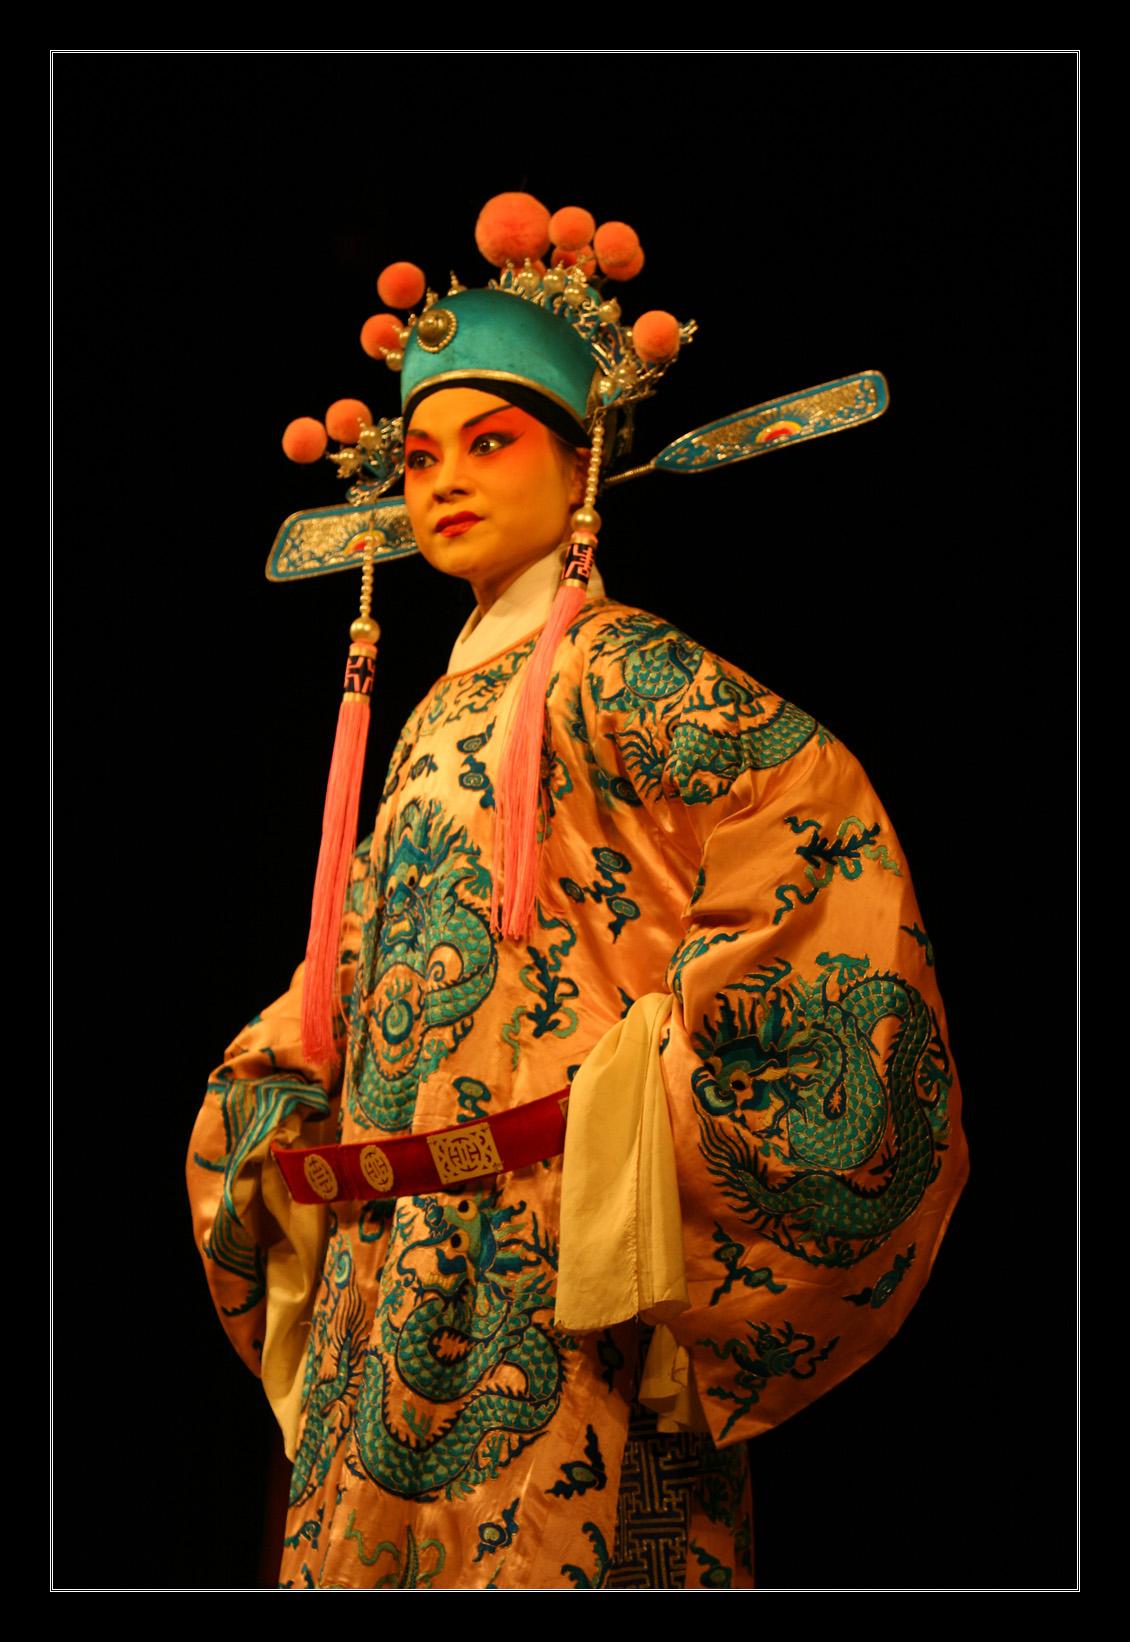 Sichuan Opera Chongqing China by davidmcb